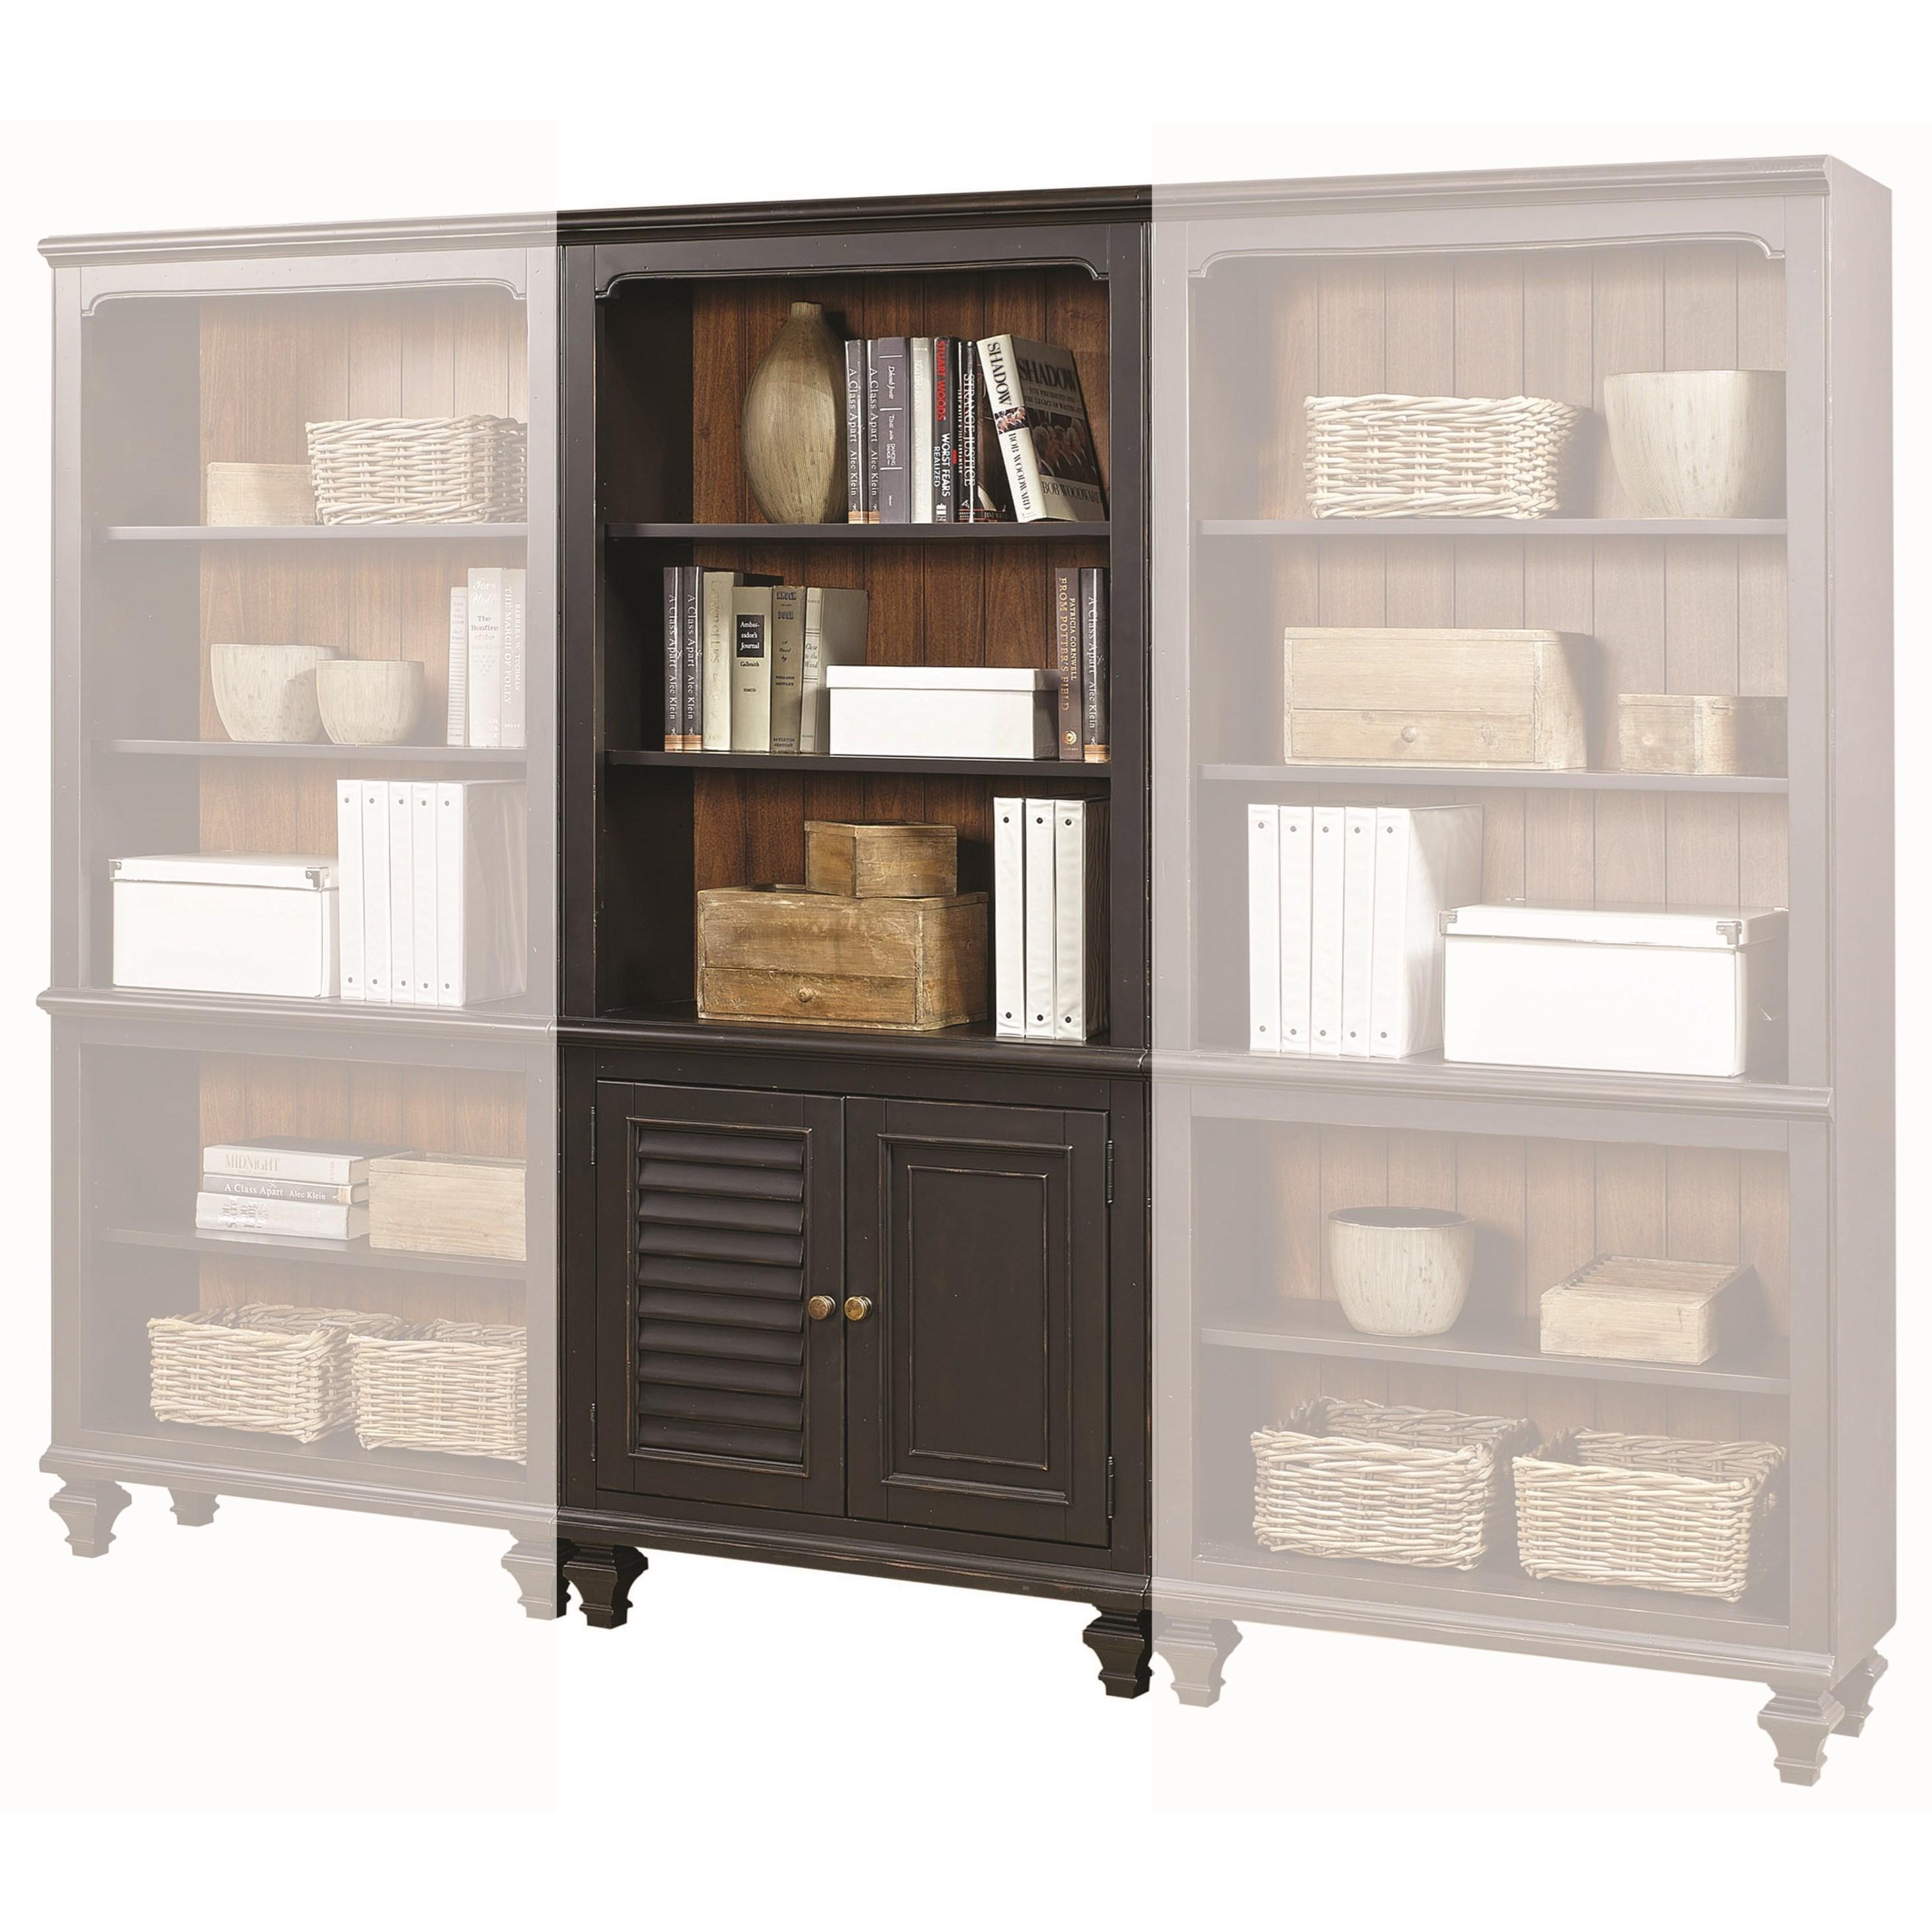 Aspenhome Ravenwood Bookcase - Item Number: I65-332